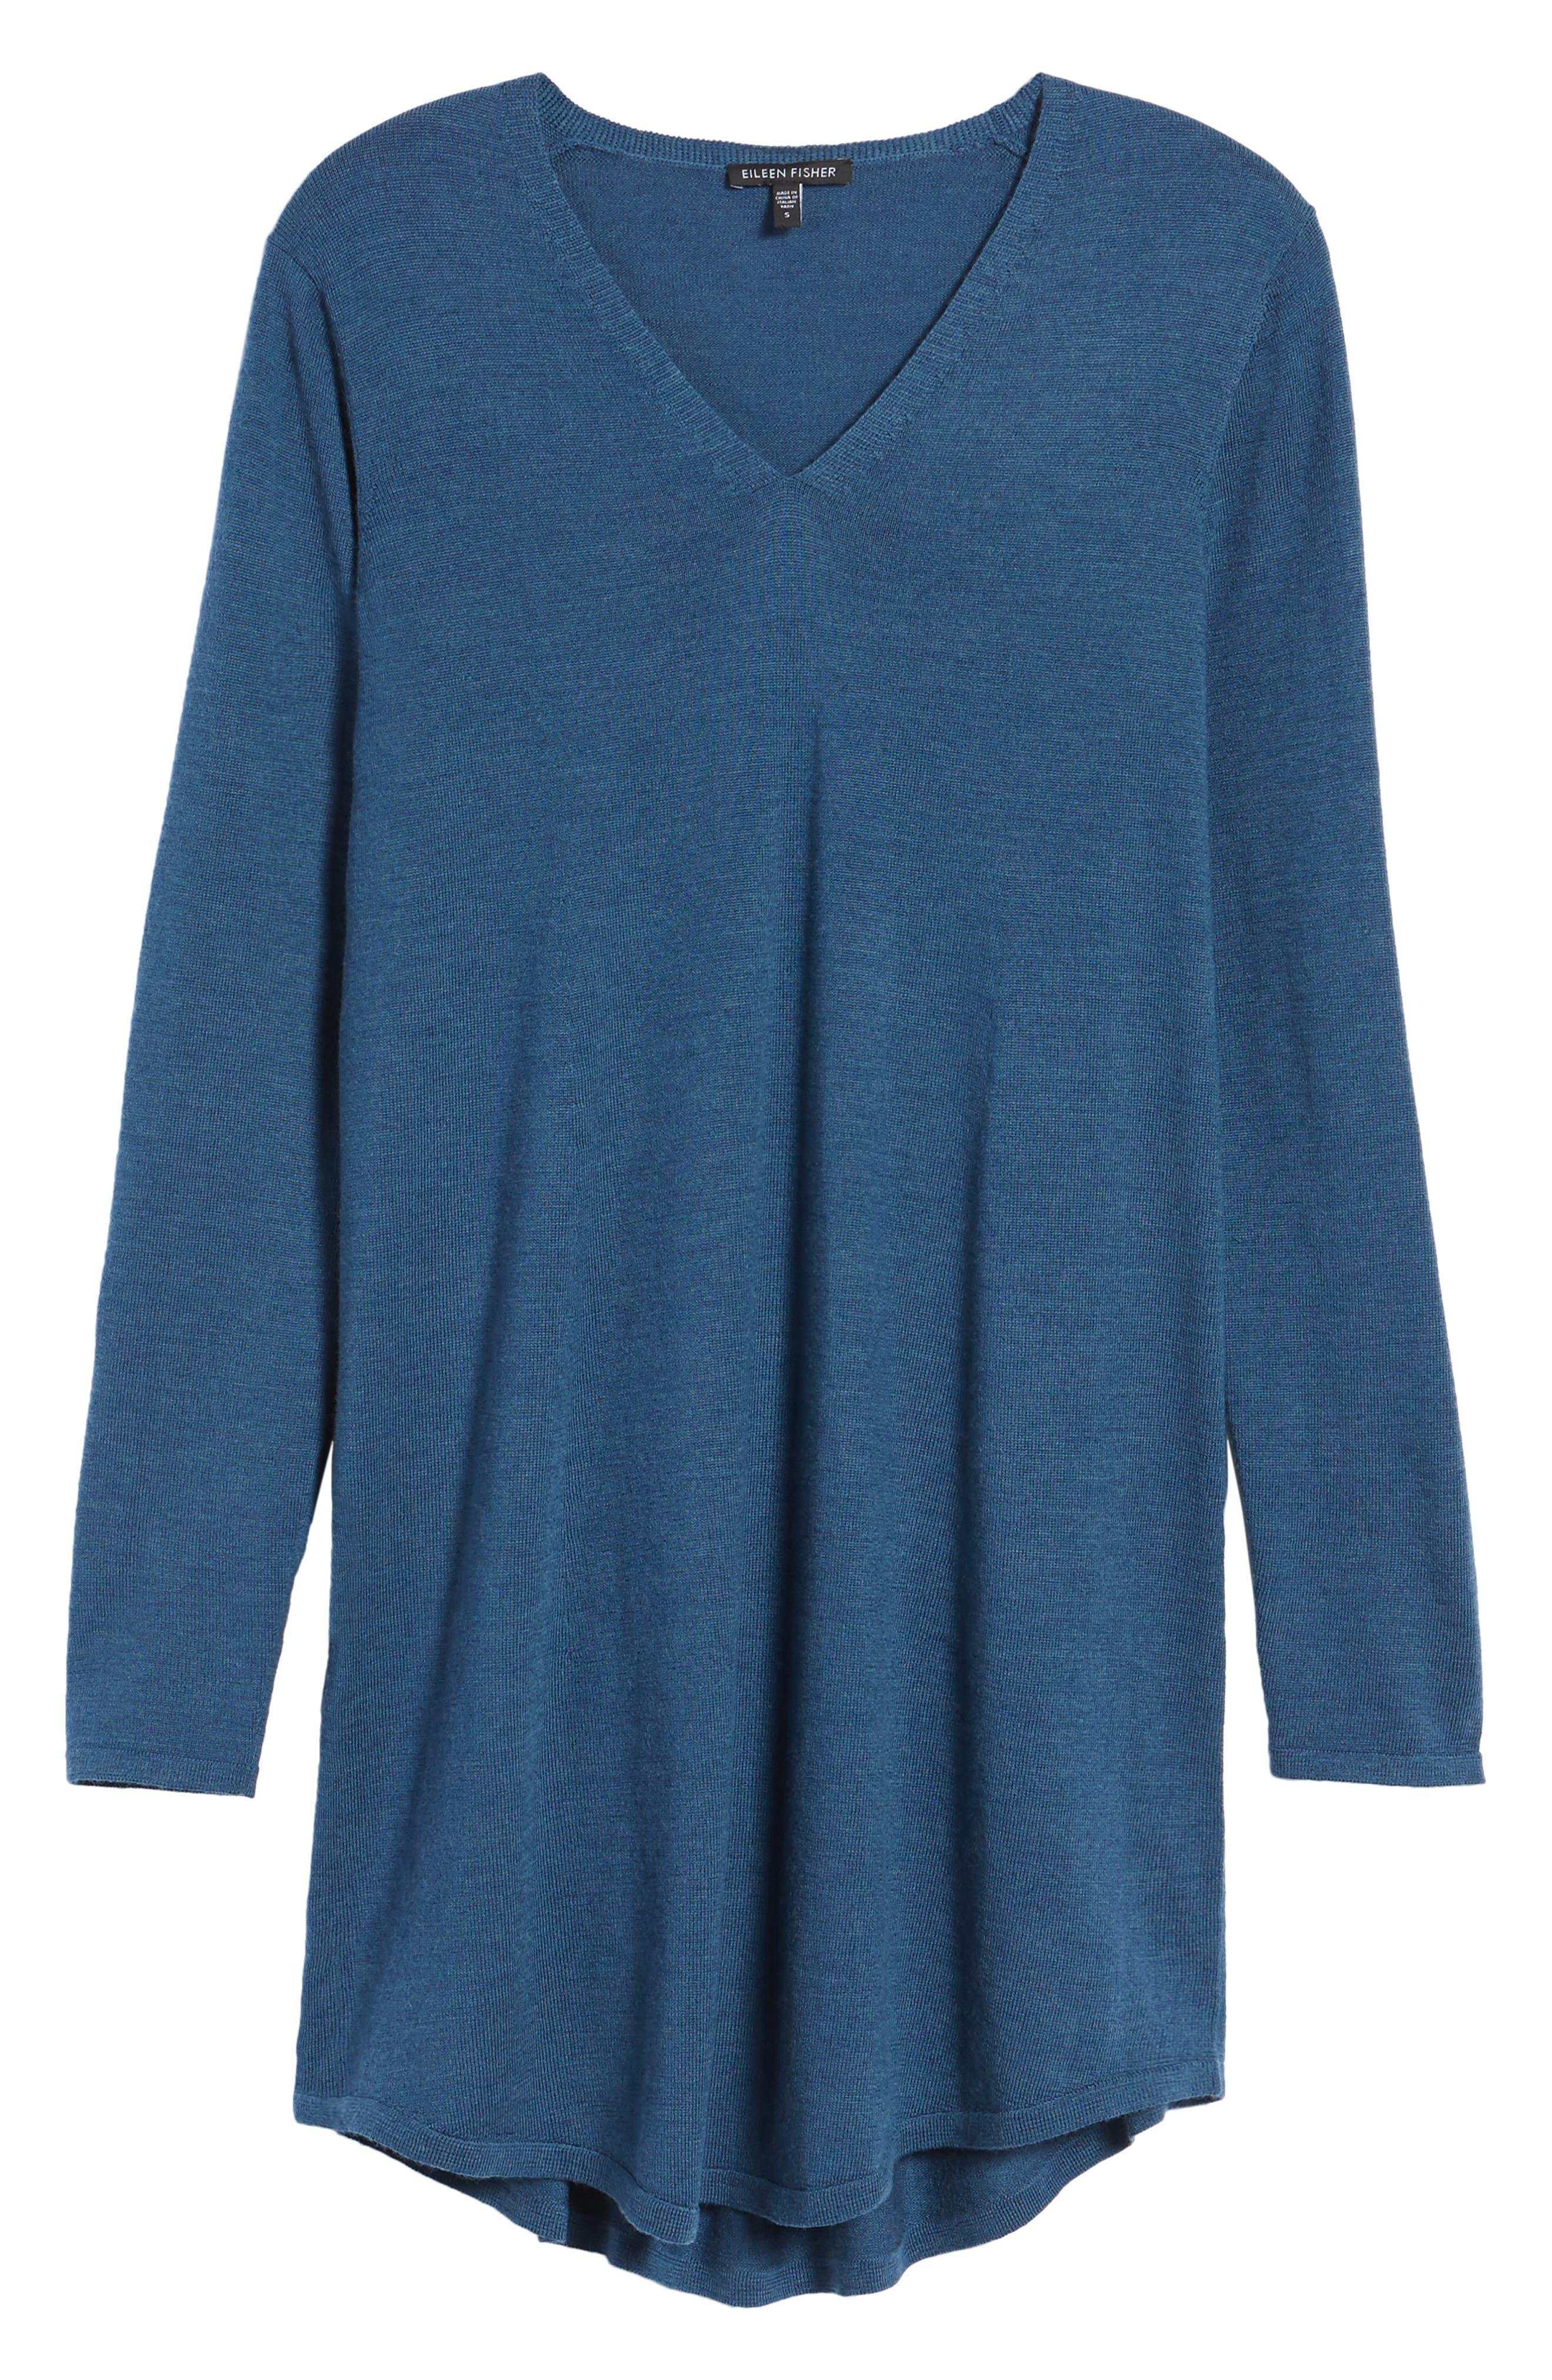 Alternate Image 1 Selected - Eileen Fisher Lightweight Merino Jersey V-Neck Tunic (Regular & Petite)